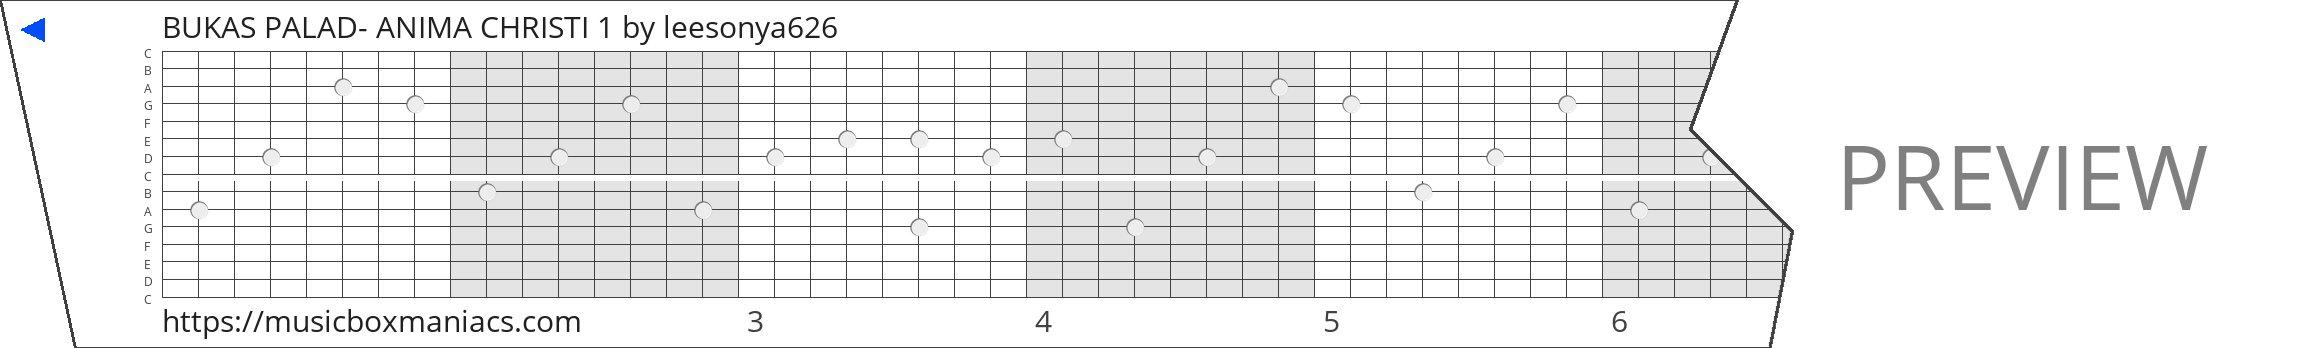 BUKAS PALAD- ANIMA CHRISTI 1 15 note music box paper strip